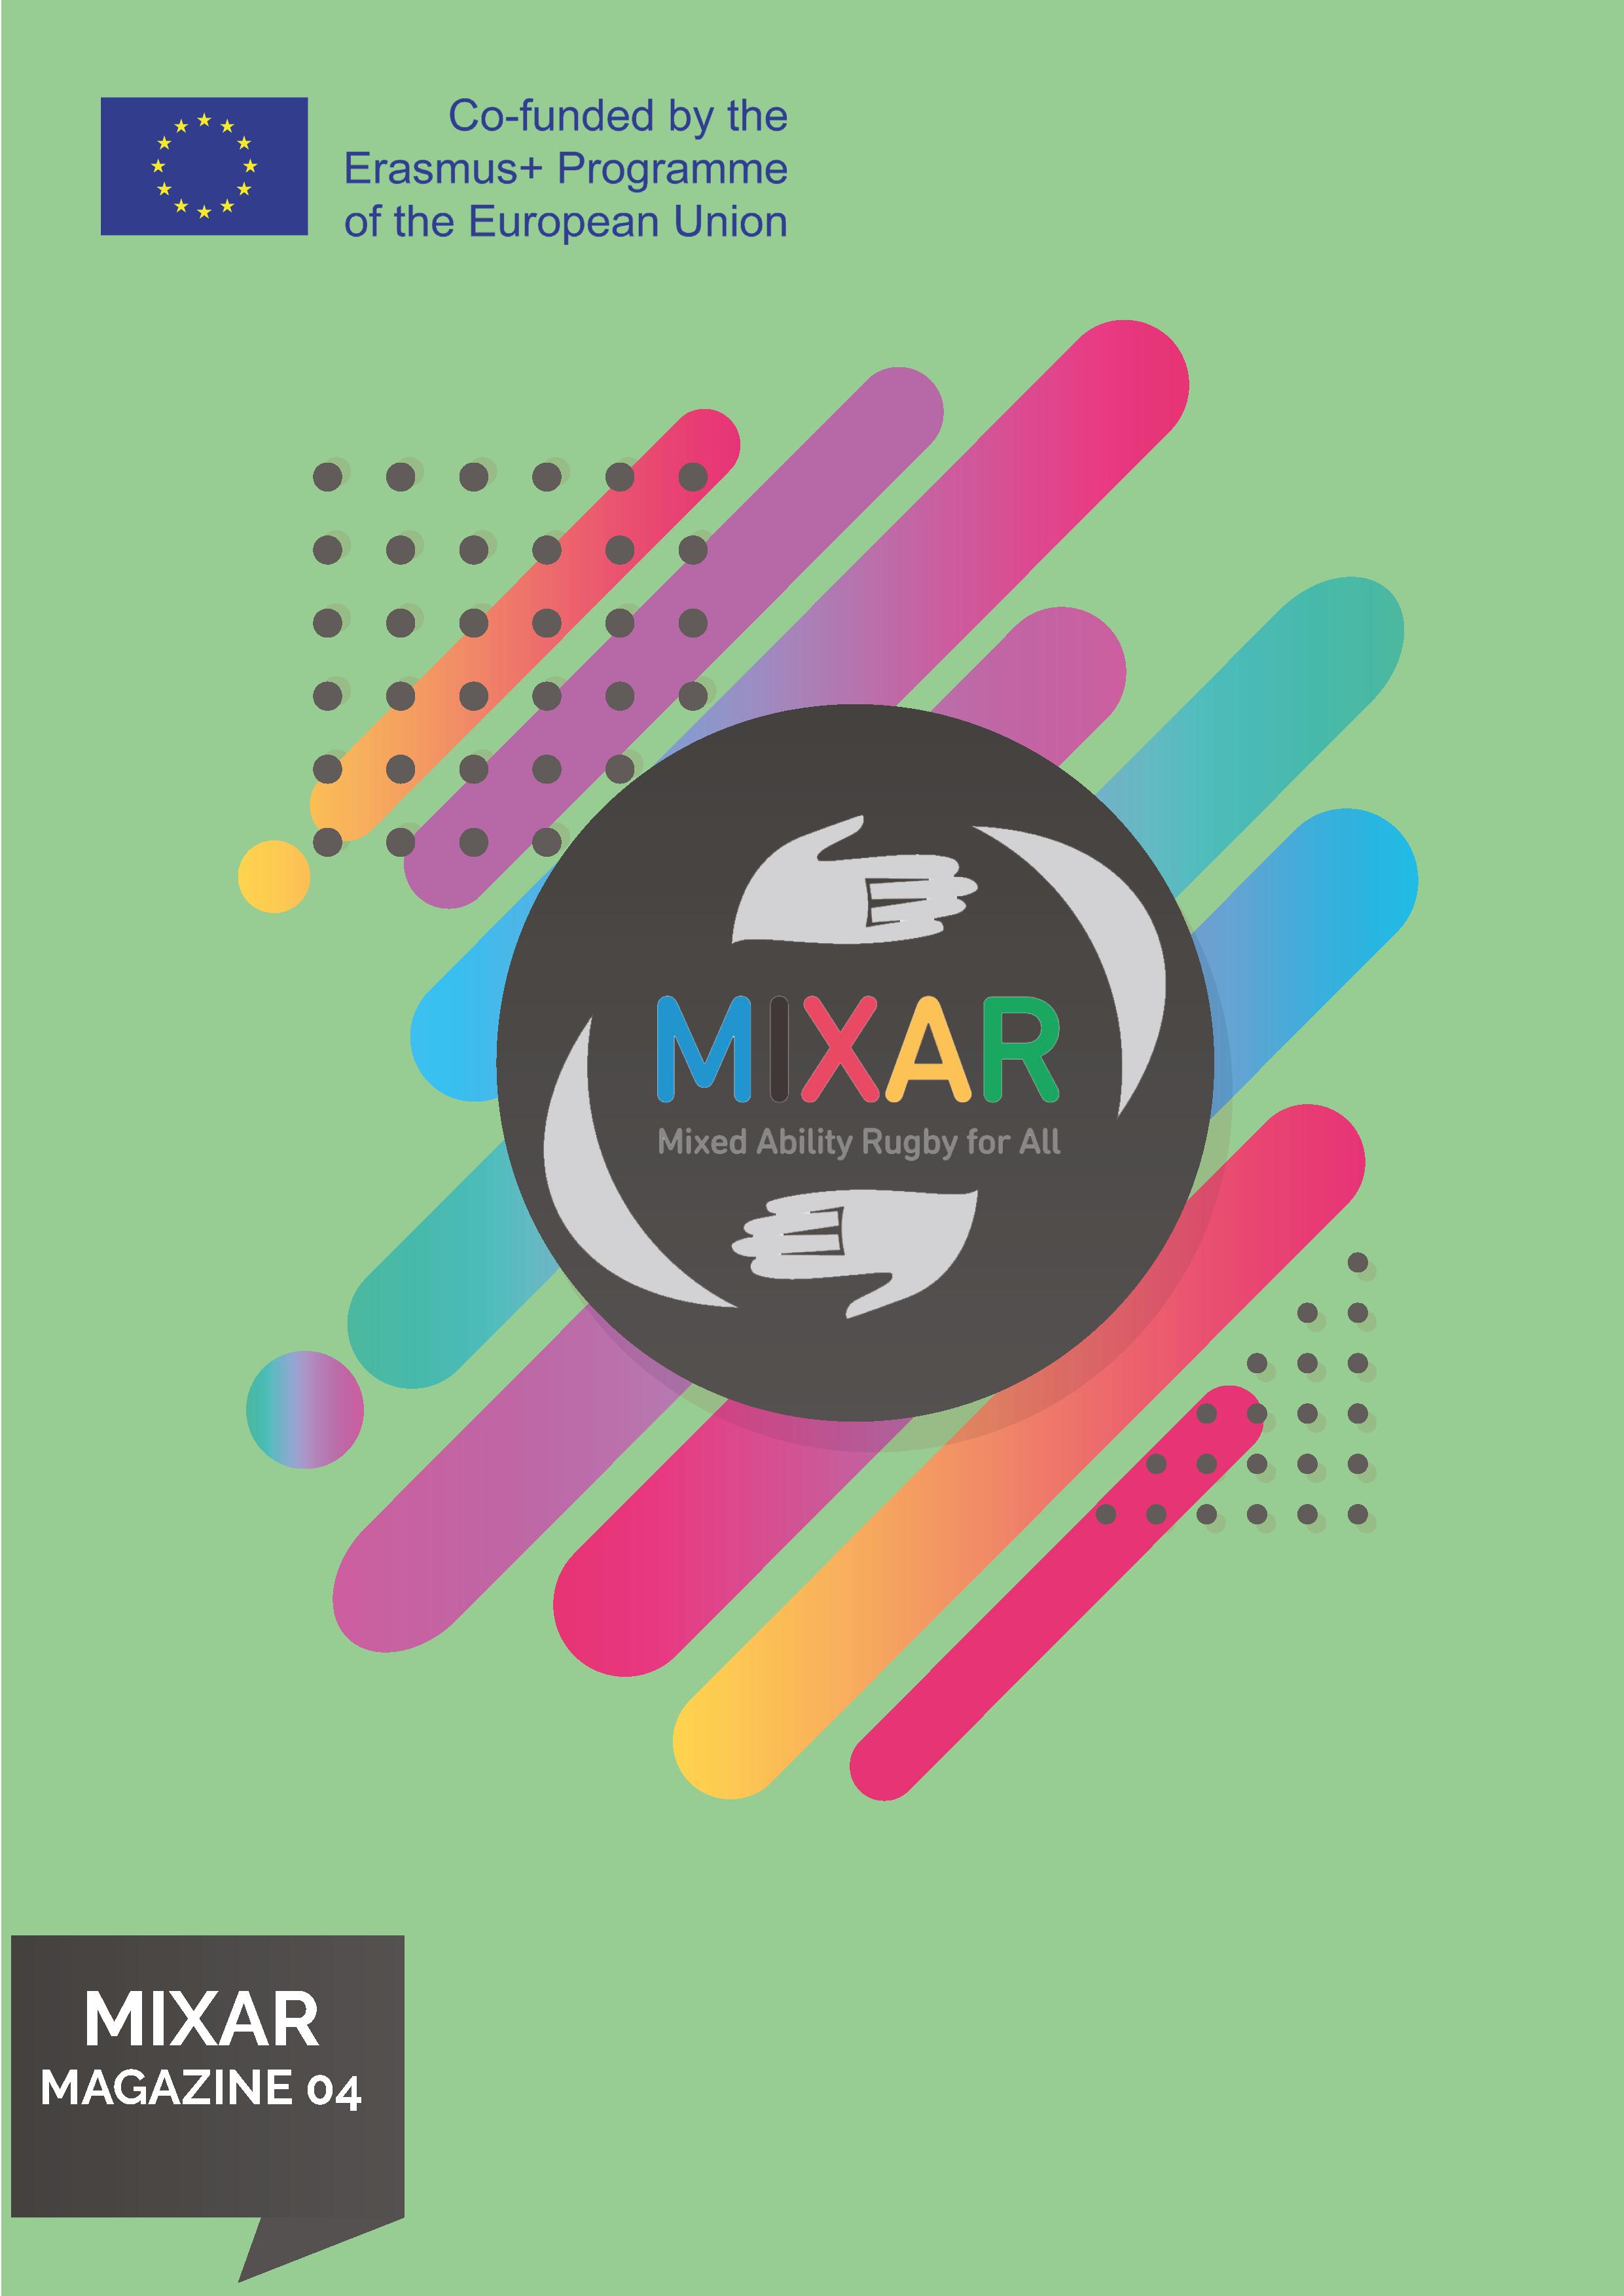 MIXAR-Magazine-04-23-12-19_Page_01